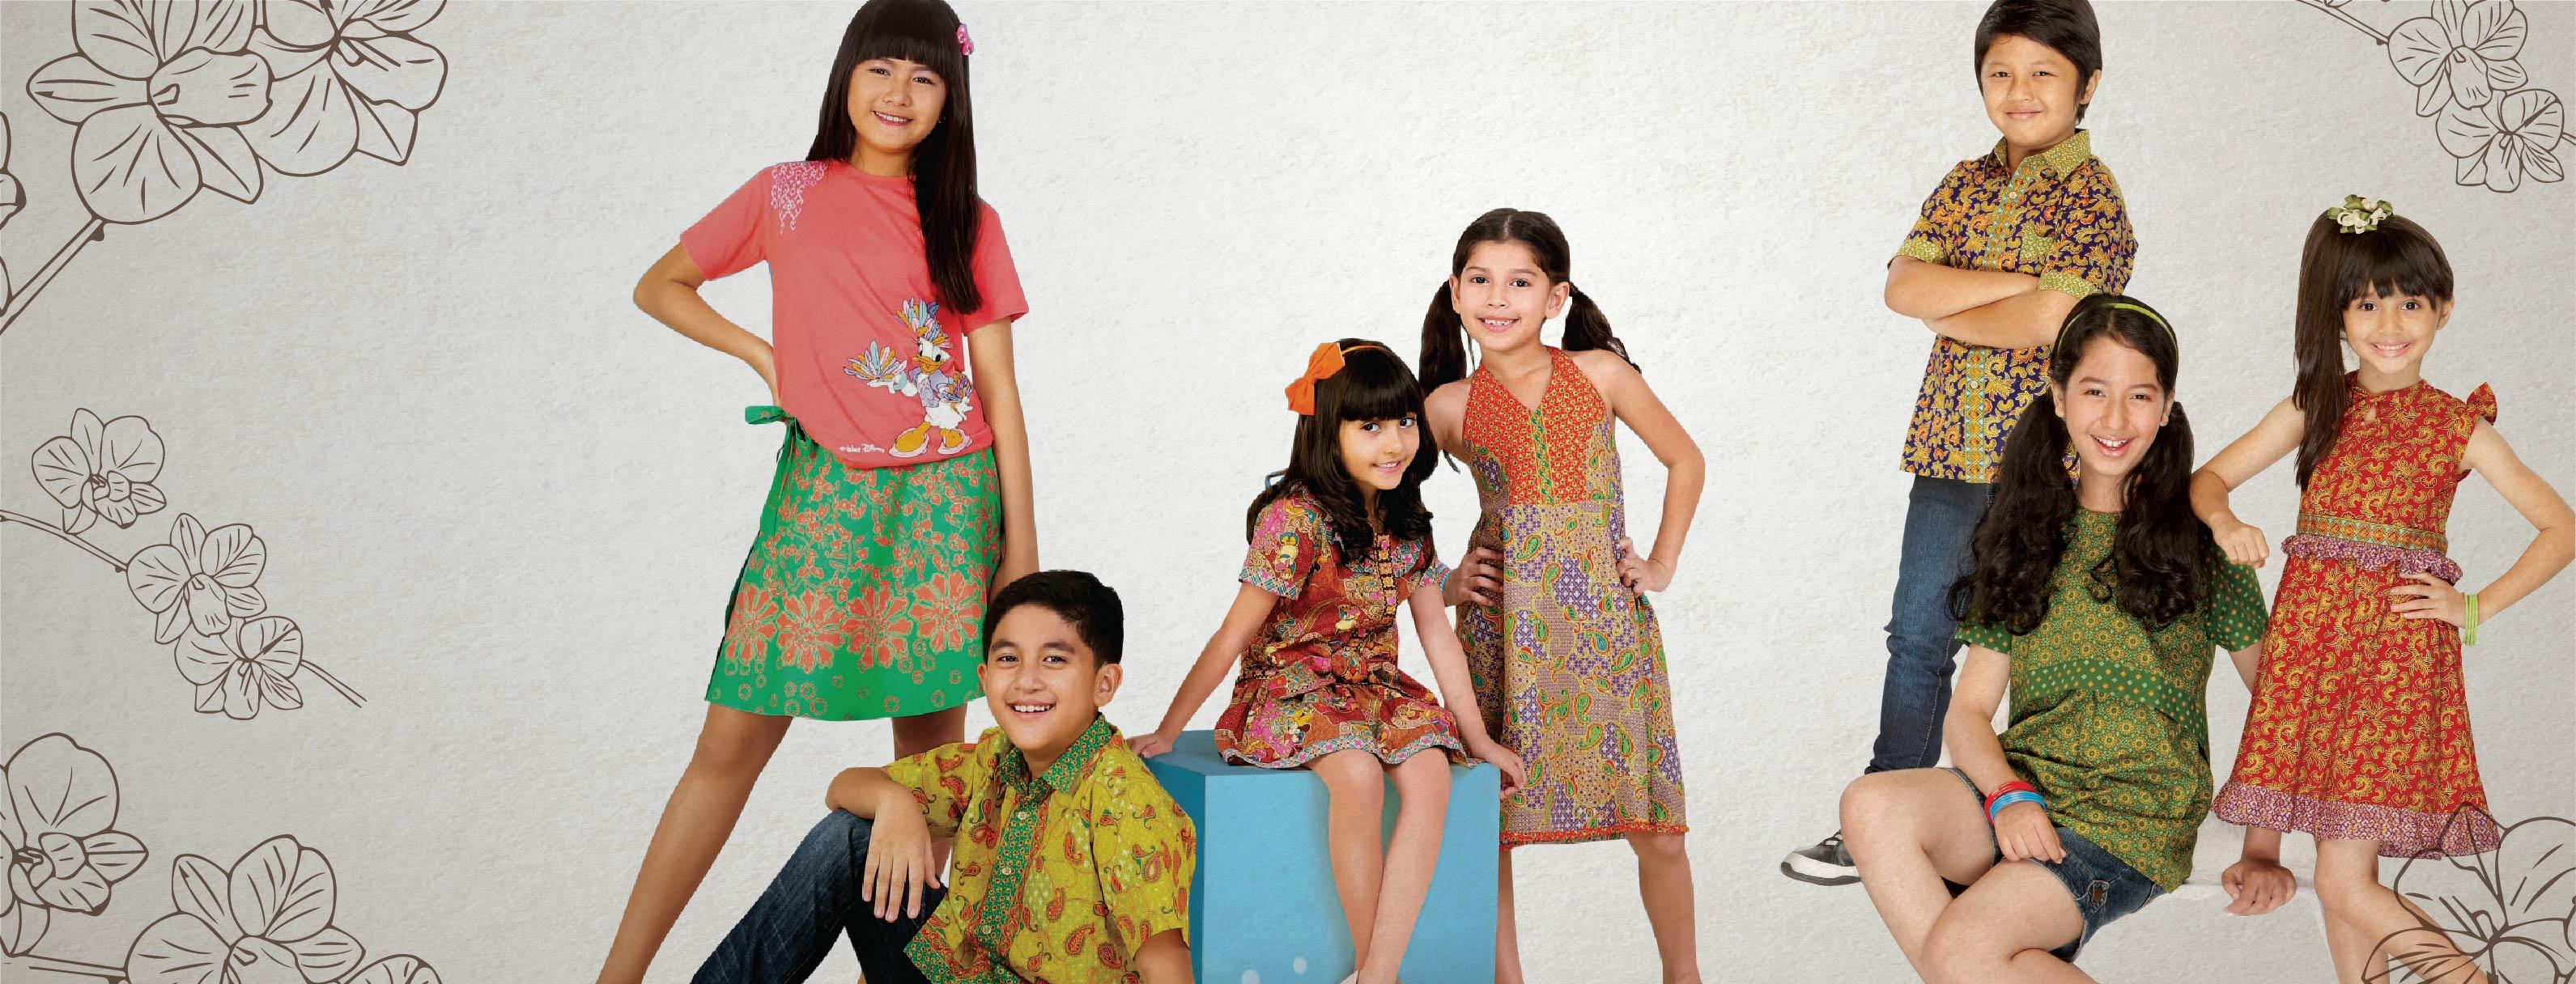 Yuk, Pilih Batik Fashionable untuk Si Kecil